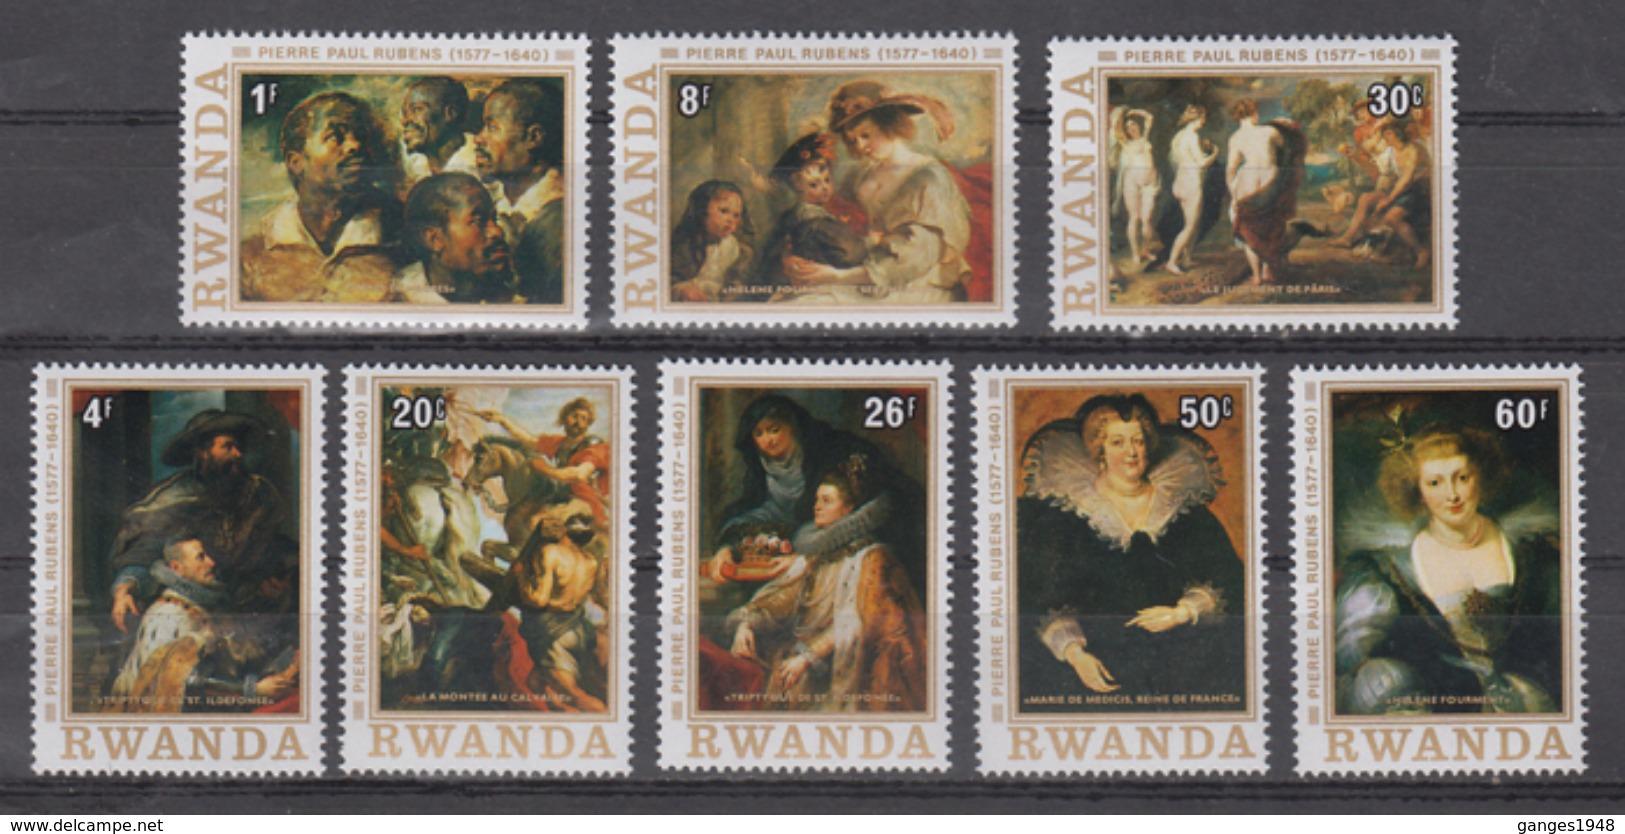 Rwanda  Rubens Paintings  8v  MNH # 65217 - Rubens